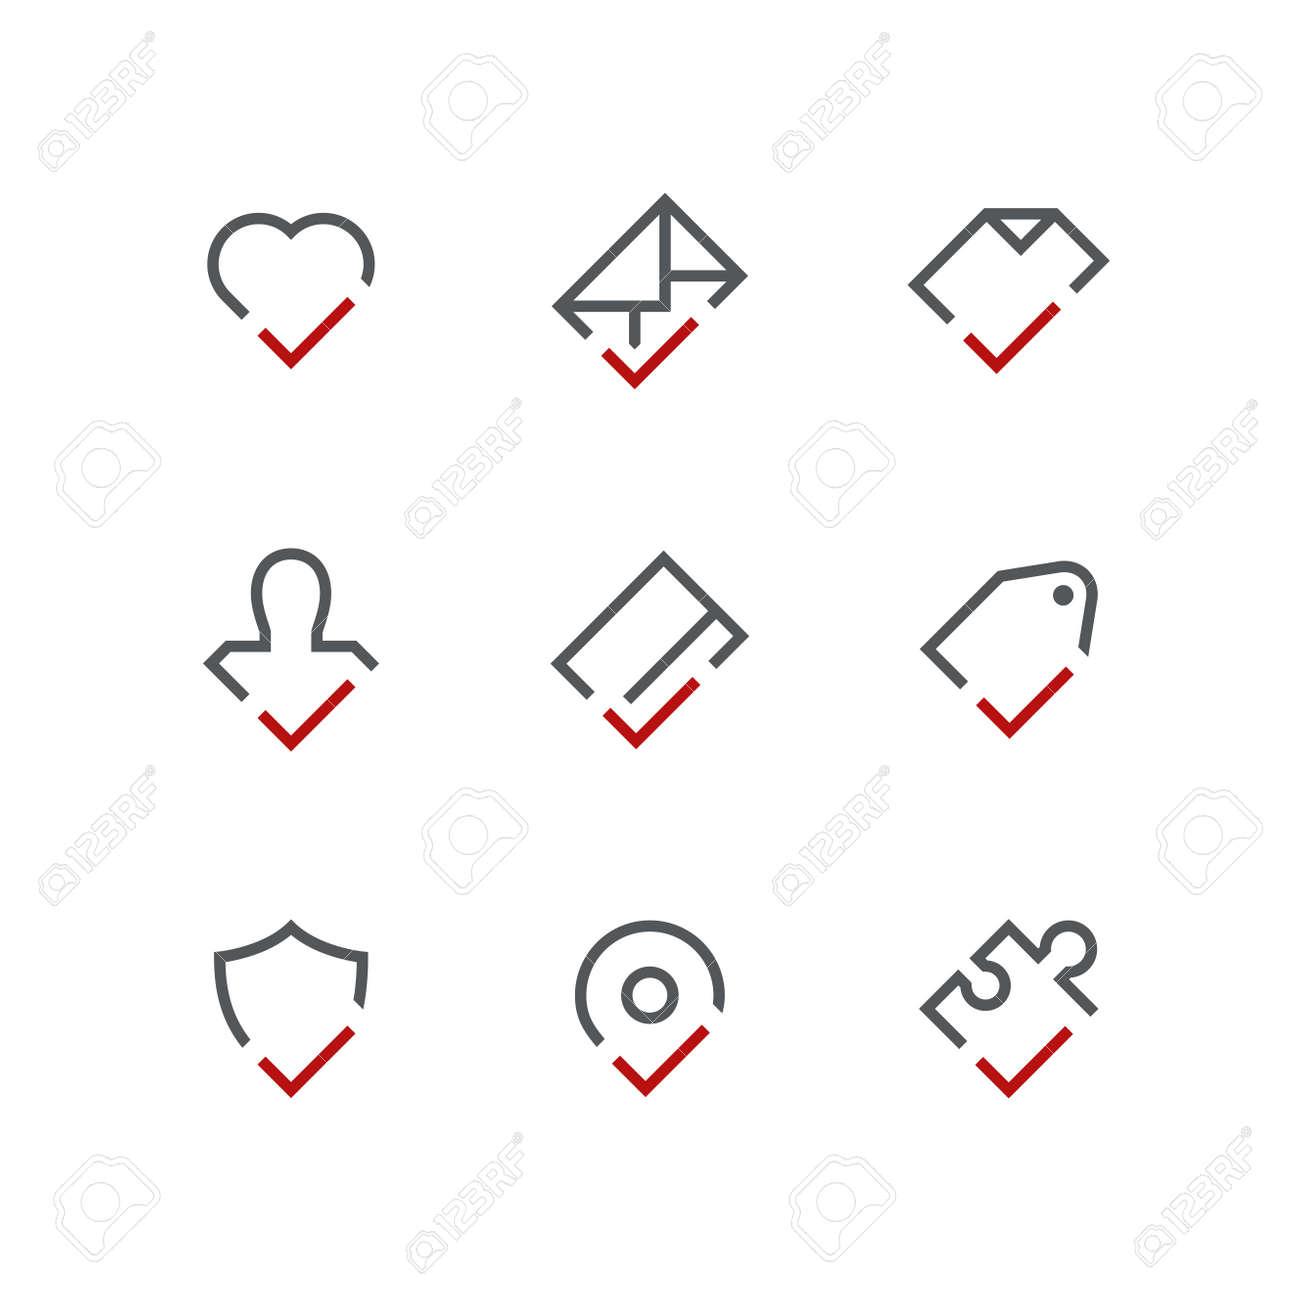 Checkmark Outline Icon Set - Heart, Envelope, Document, Person ...